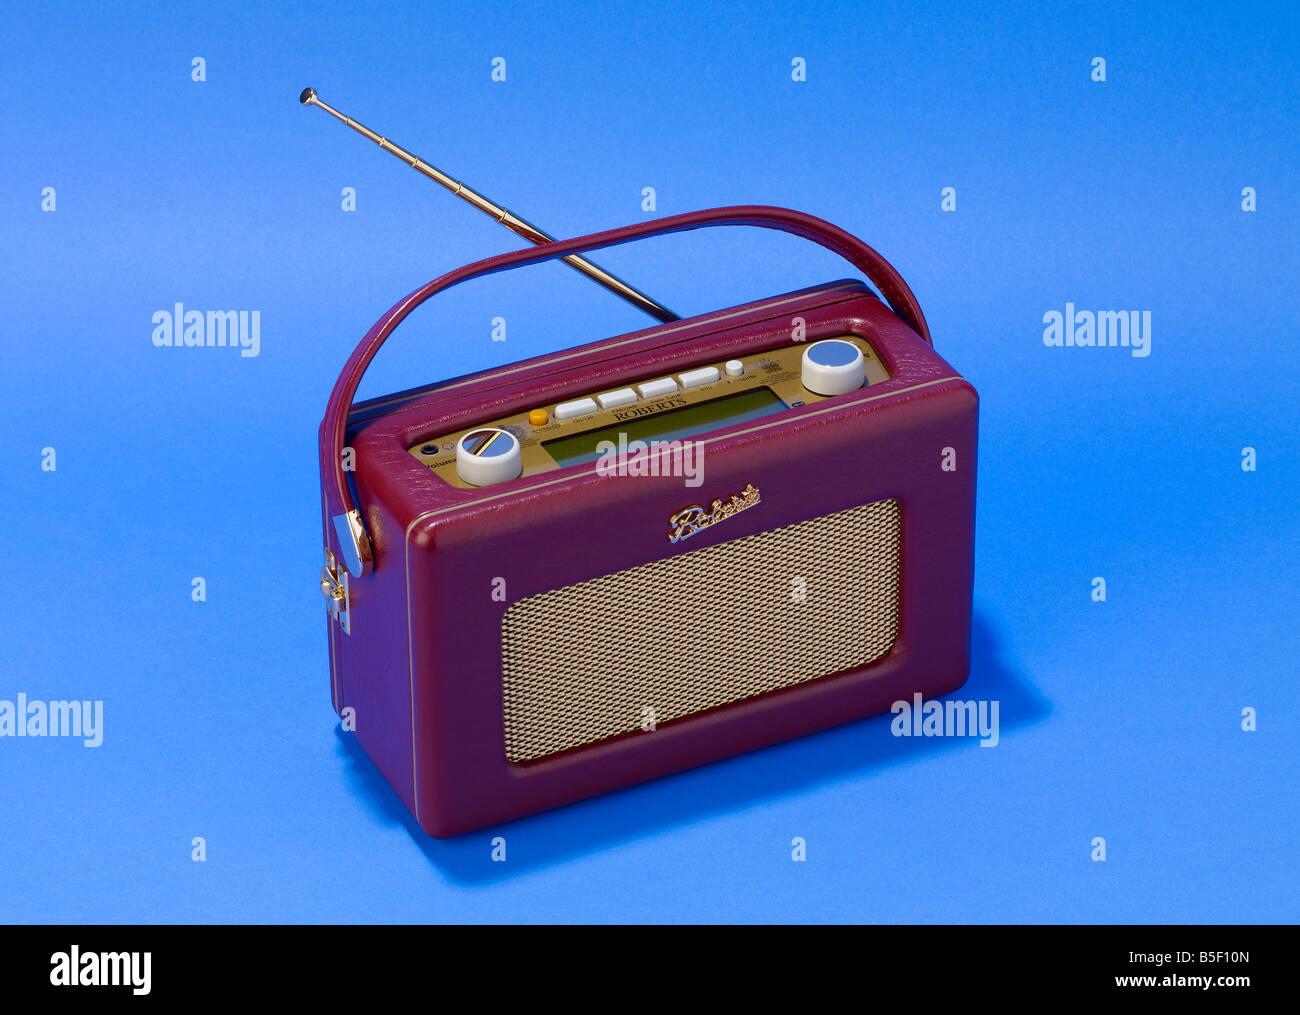 roberts radio stock photos roberts radio stock images alamy rh alamy com